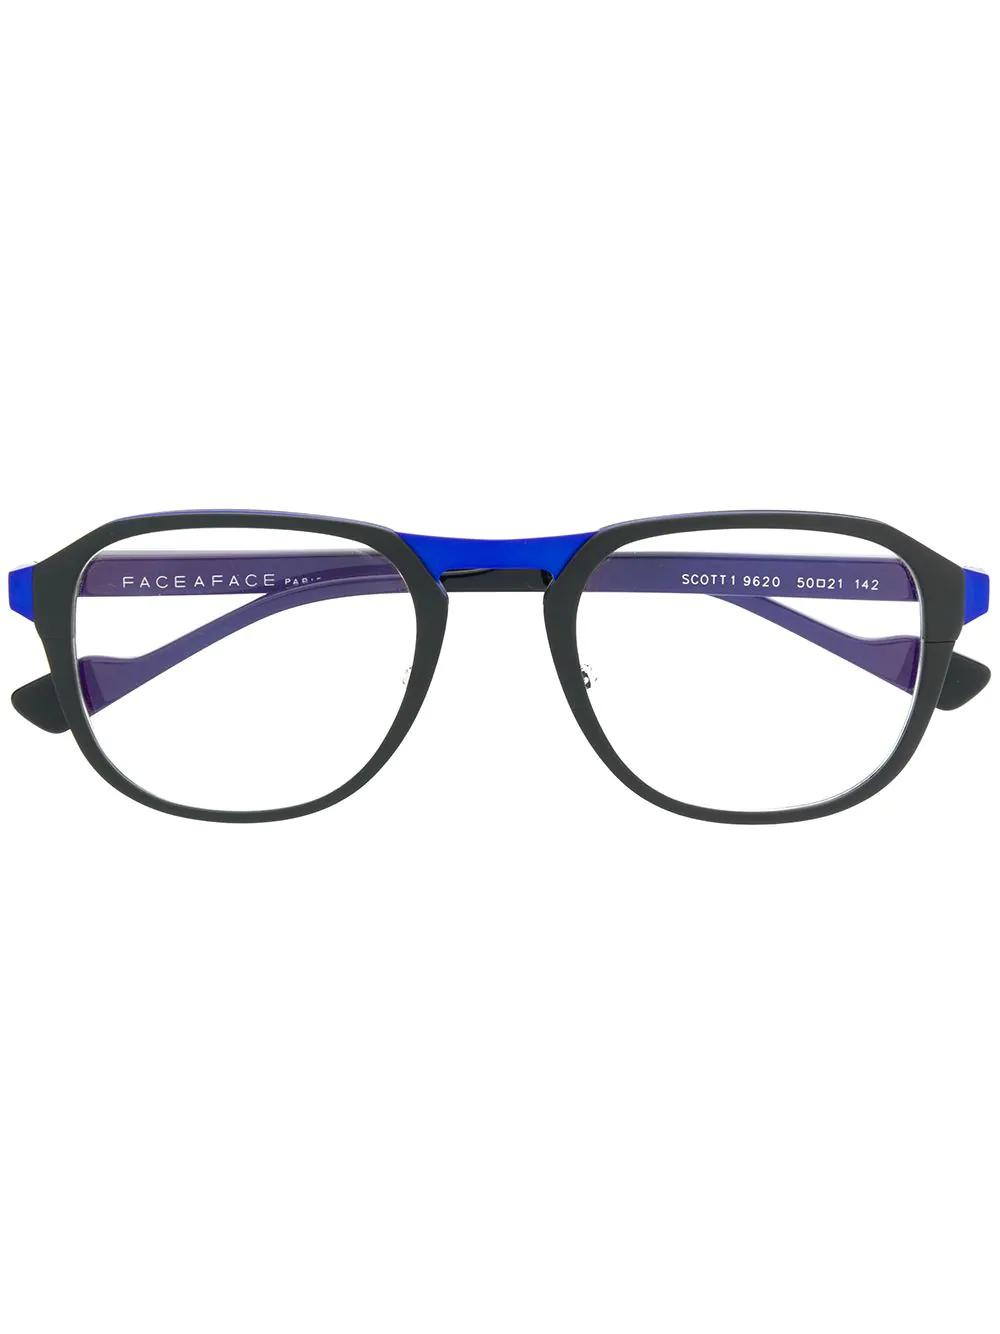 afa672e330 Face À Face Scott 1 Glasses - Black